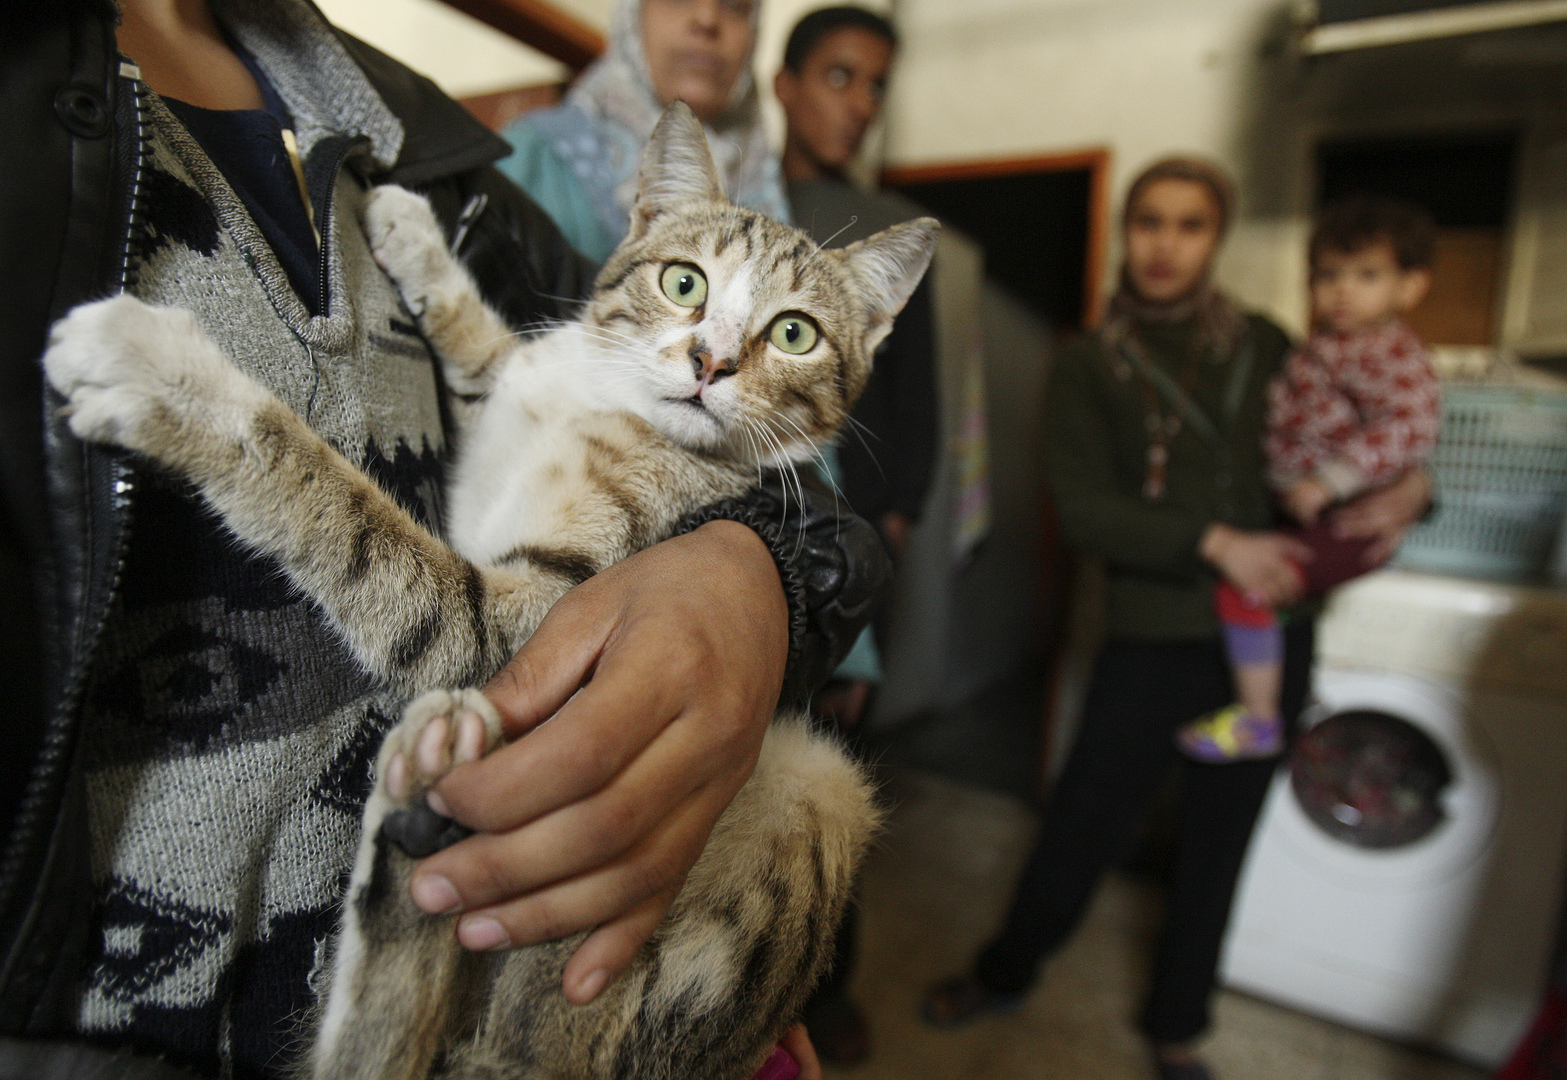 مصر.. حالات اختناق بسبب